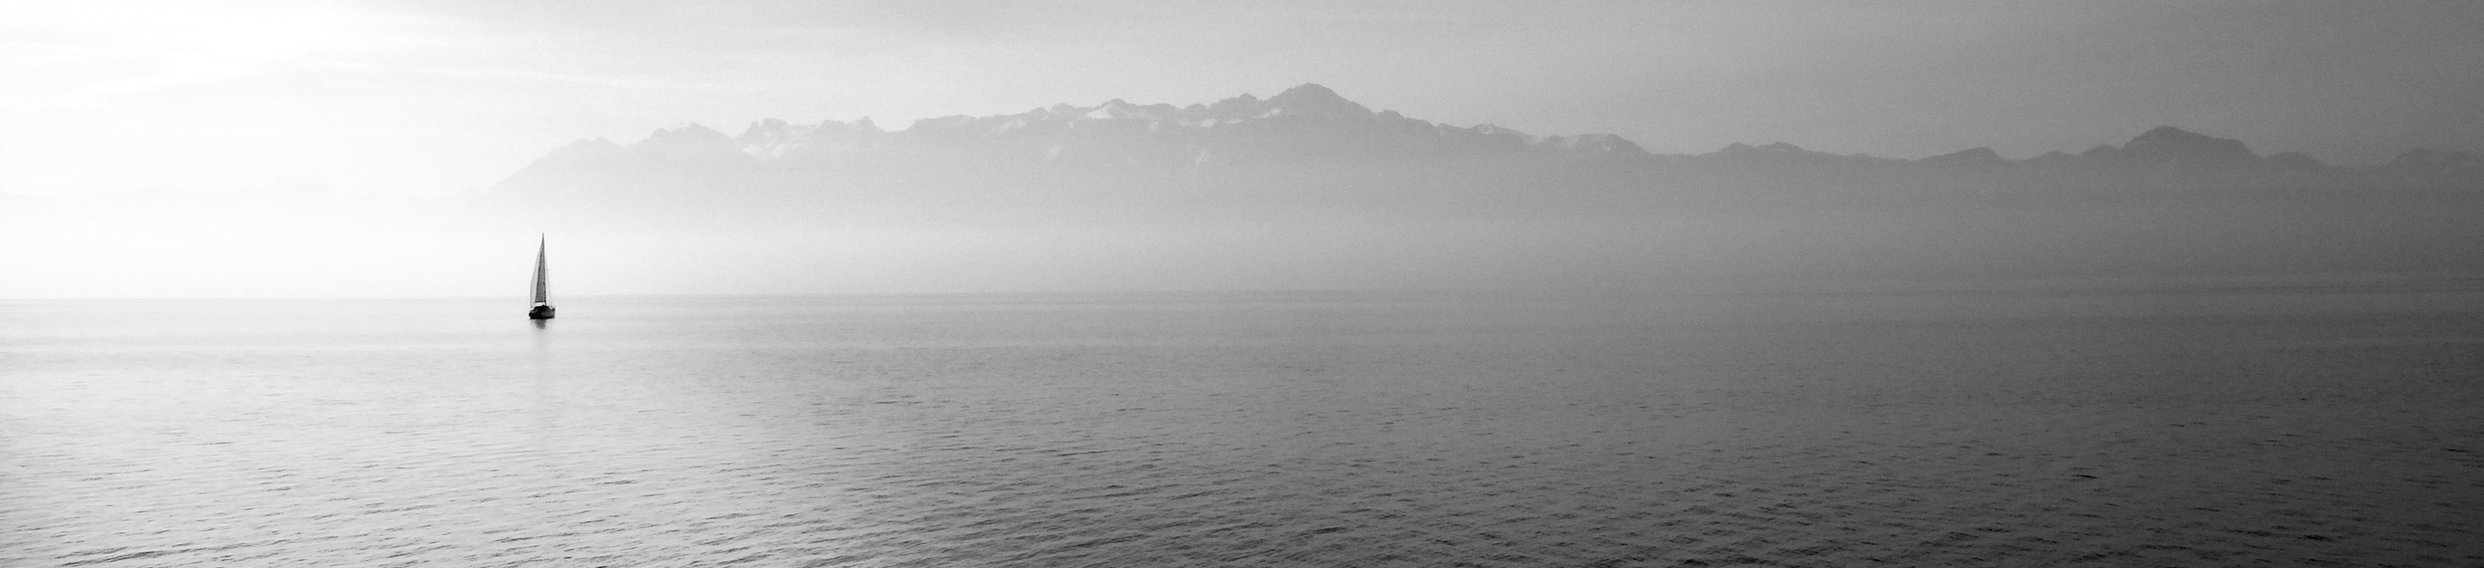 sailing-boat-569336.jpg